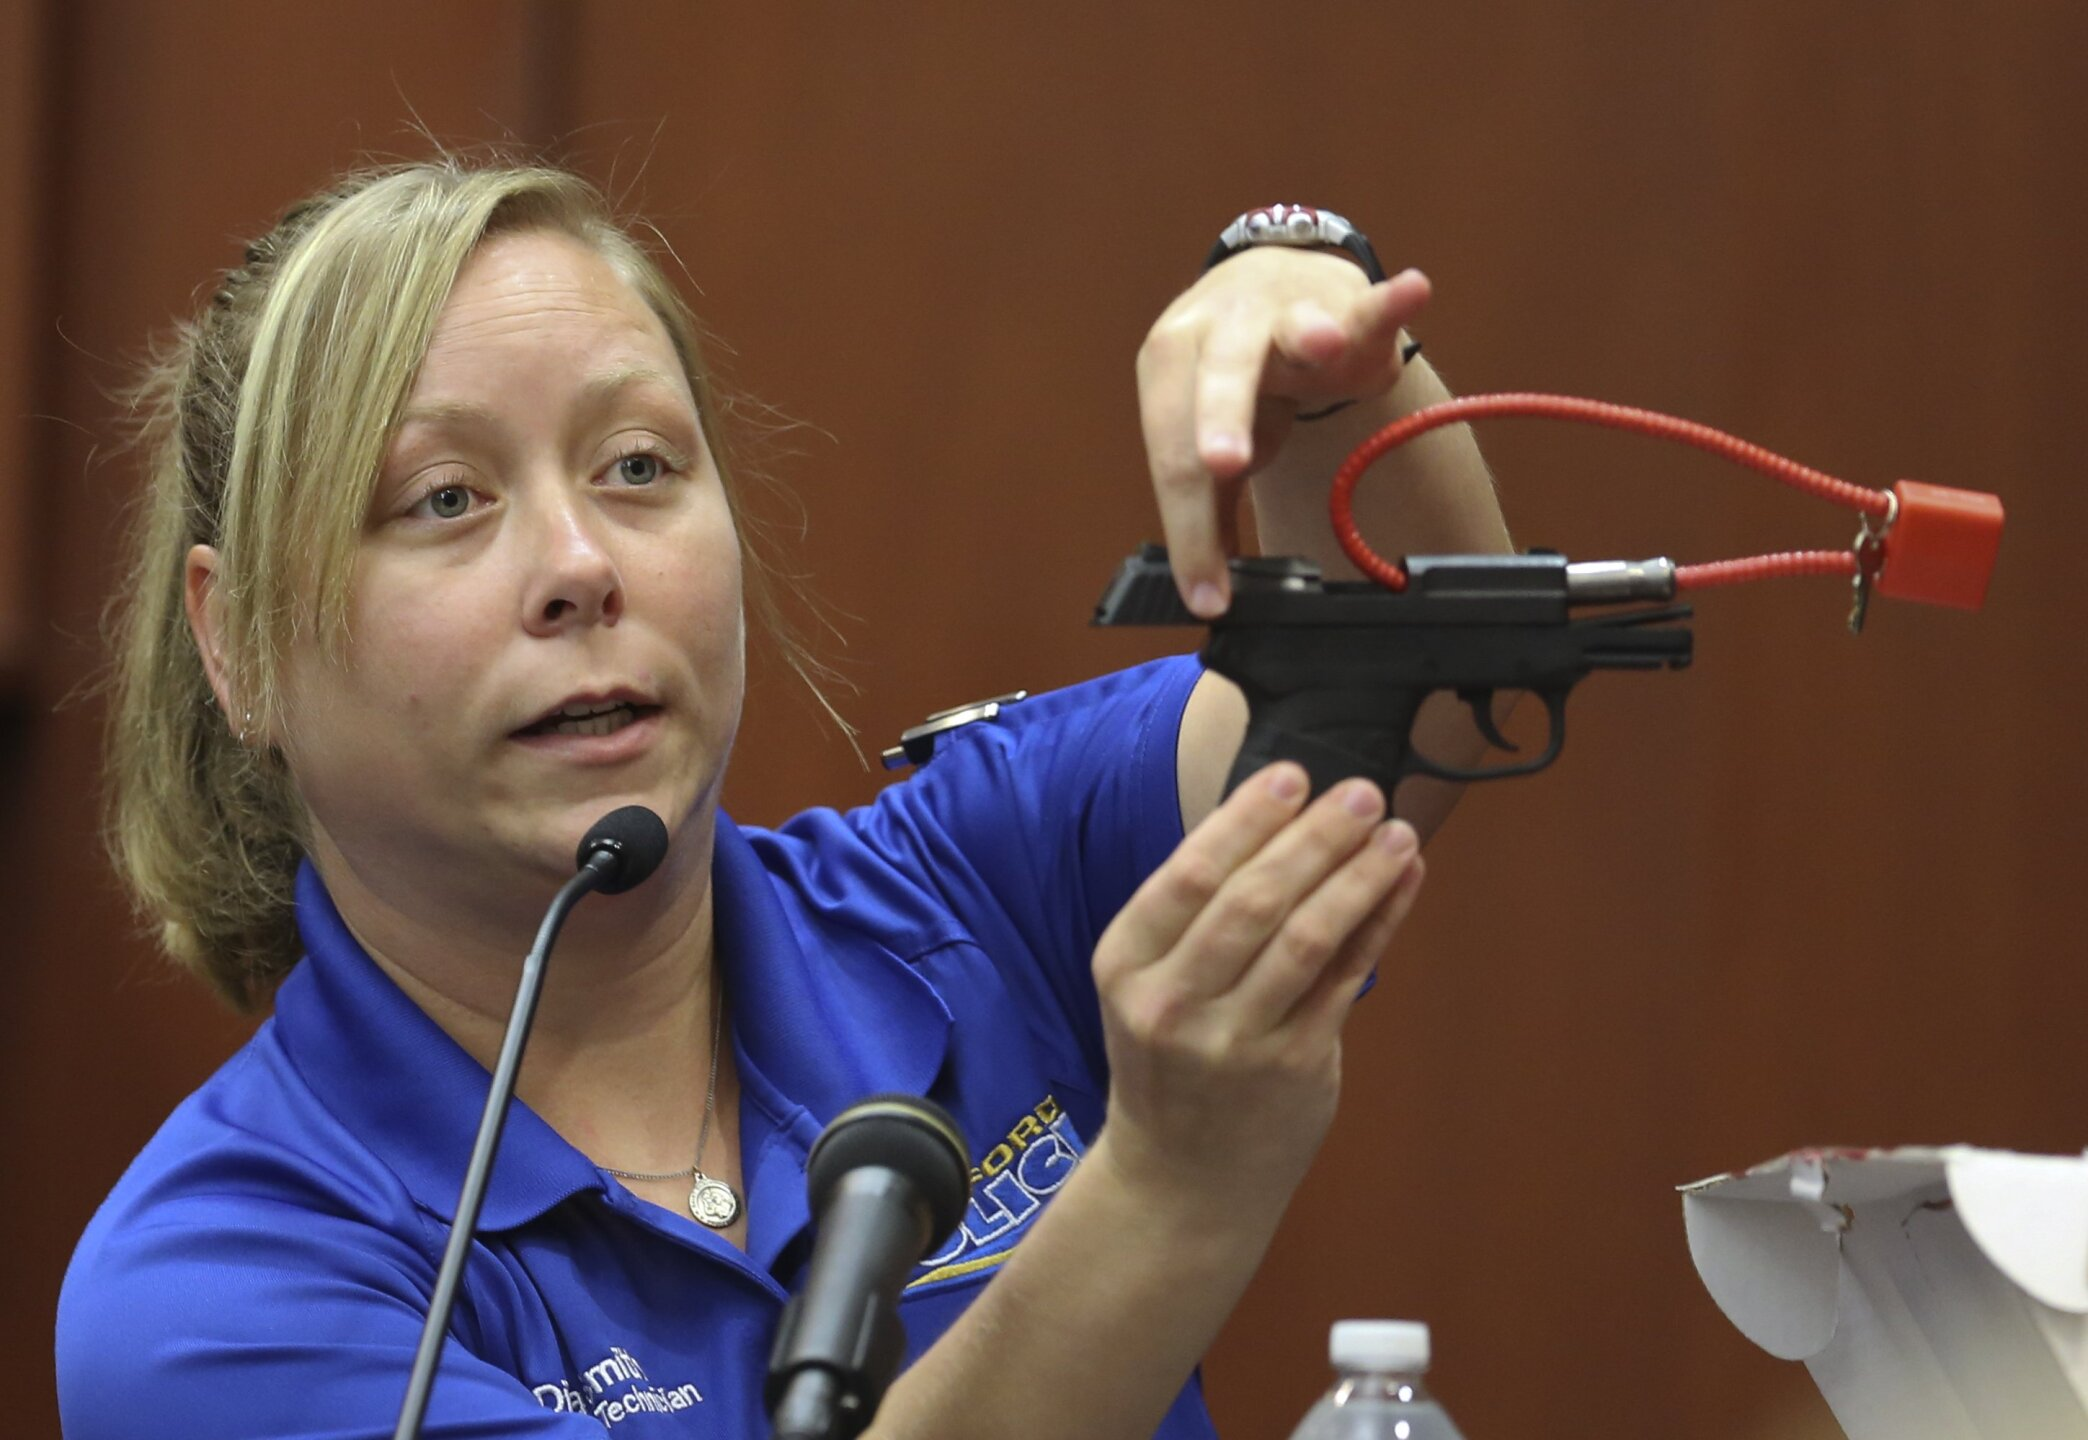 Photos: 'Racist McShootface' — George Zimmerman gun auction drawstrolls